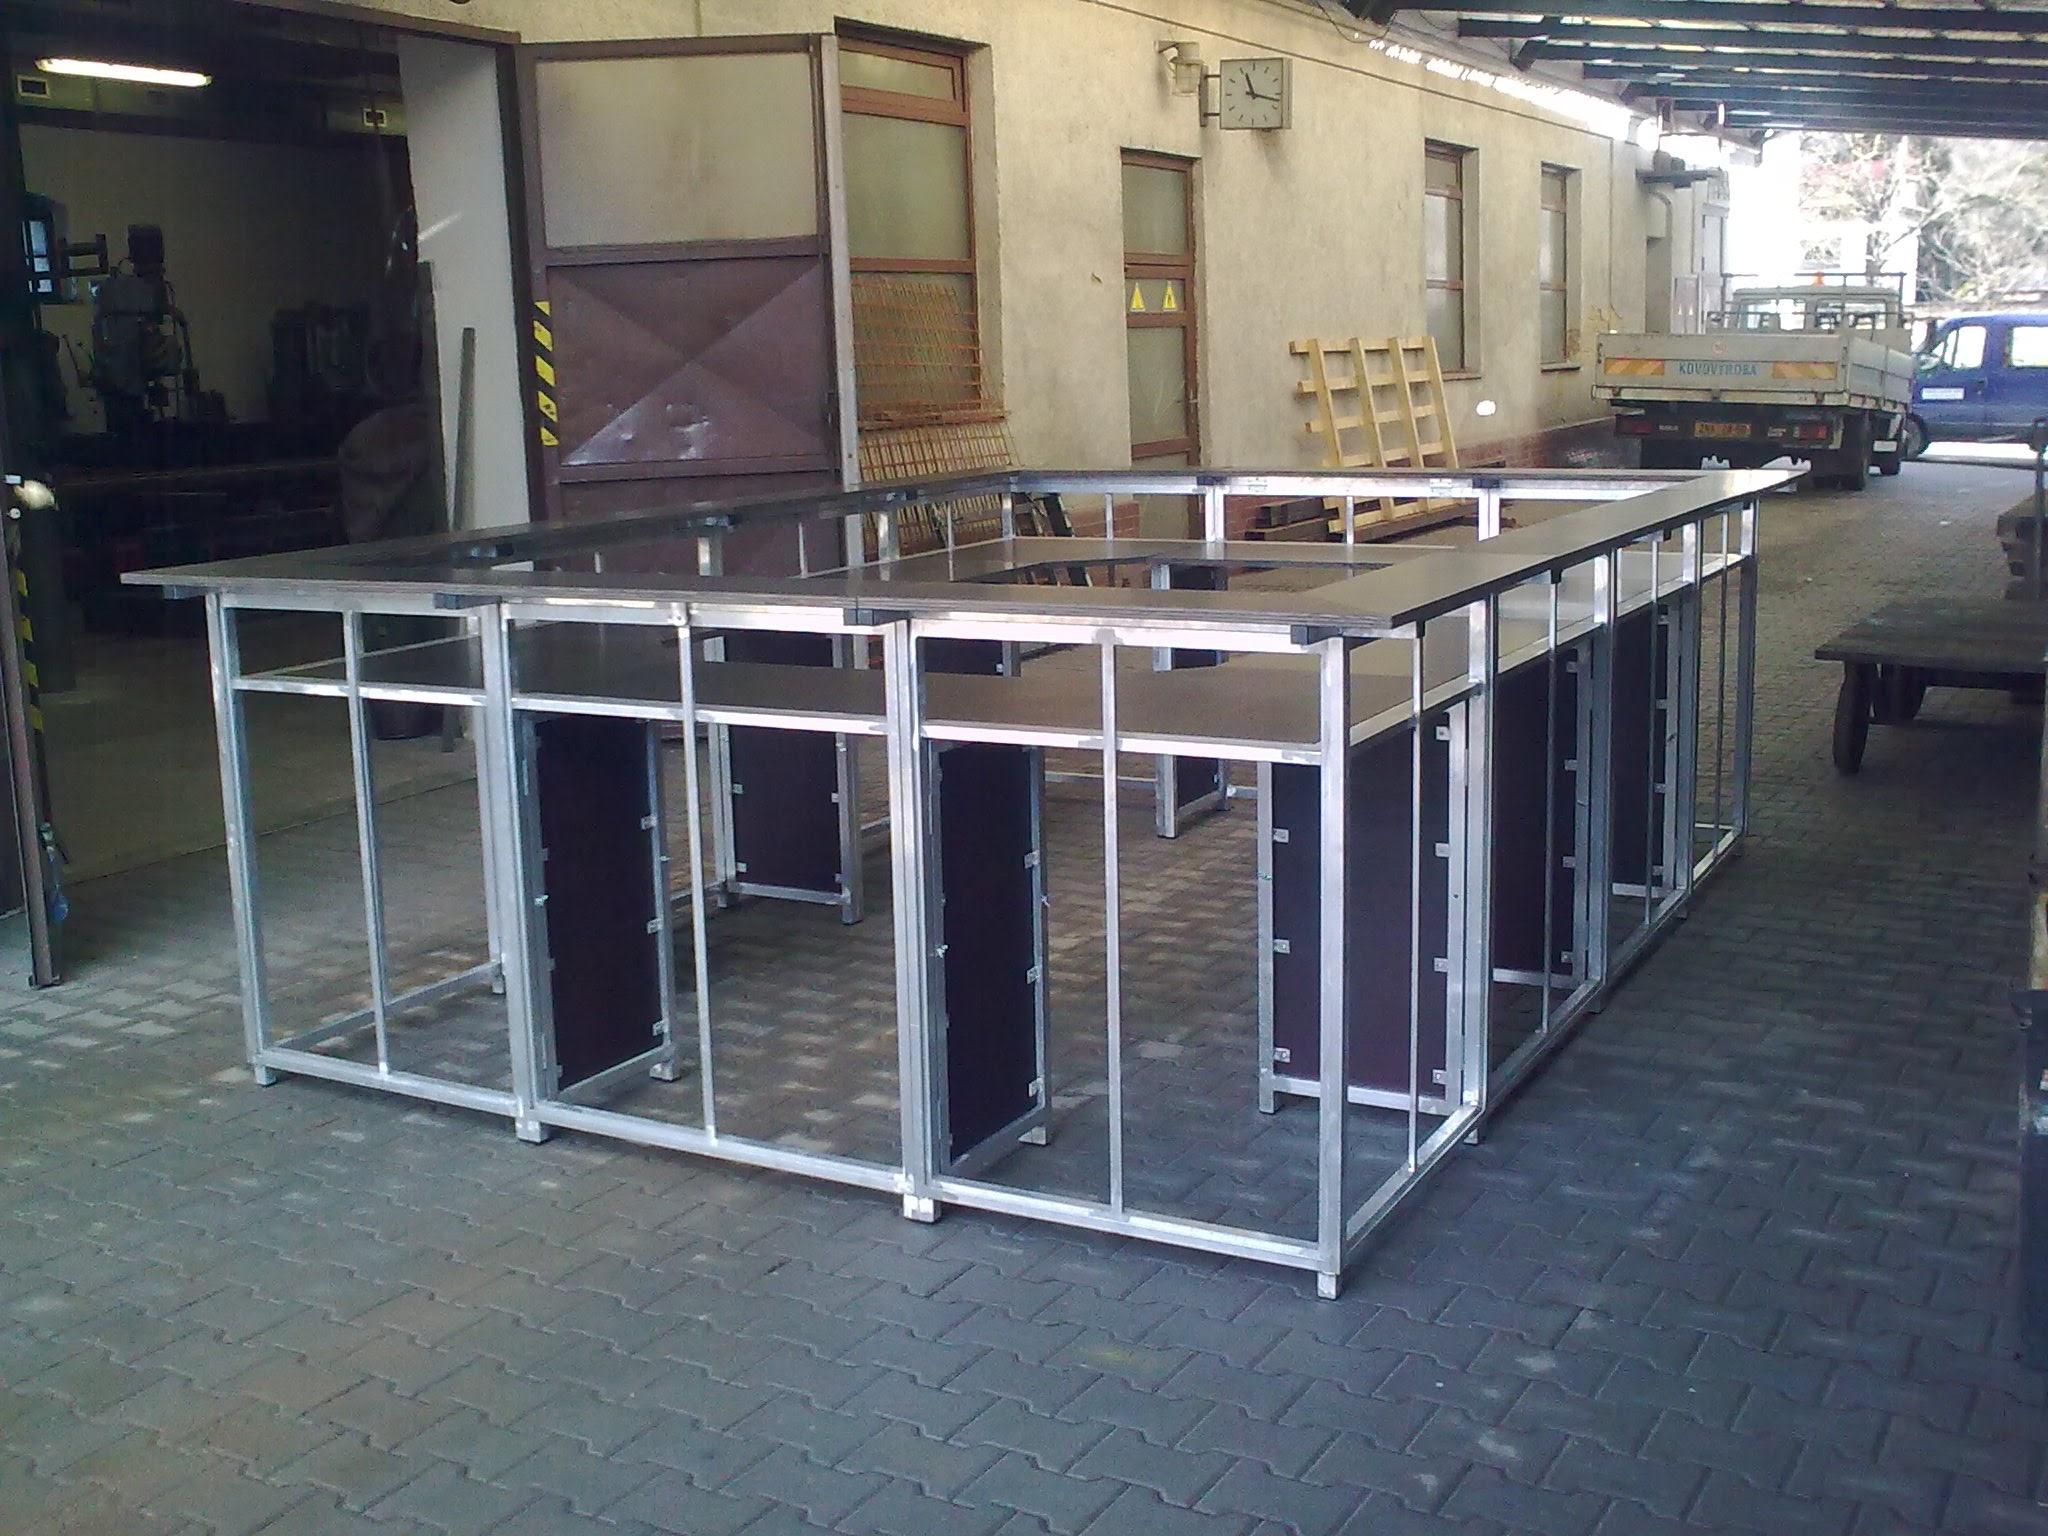 Barový stolek rozkládací hliníkový